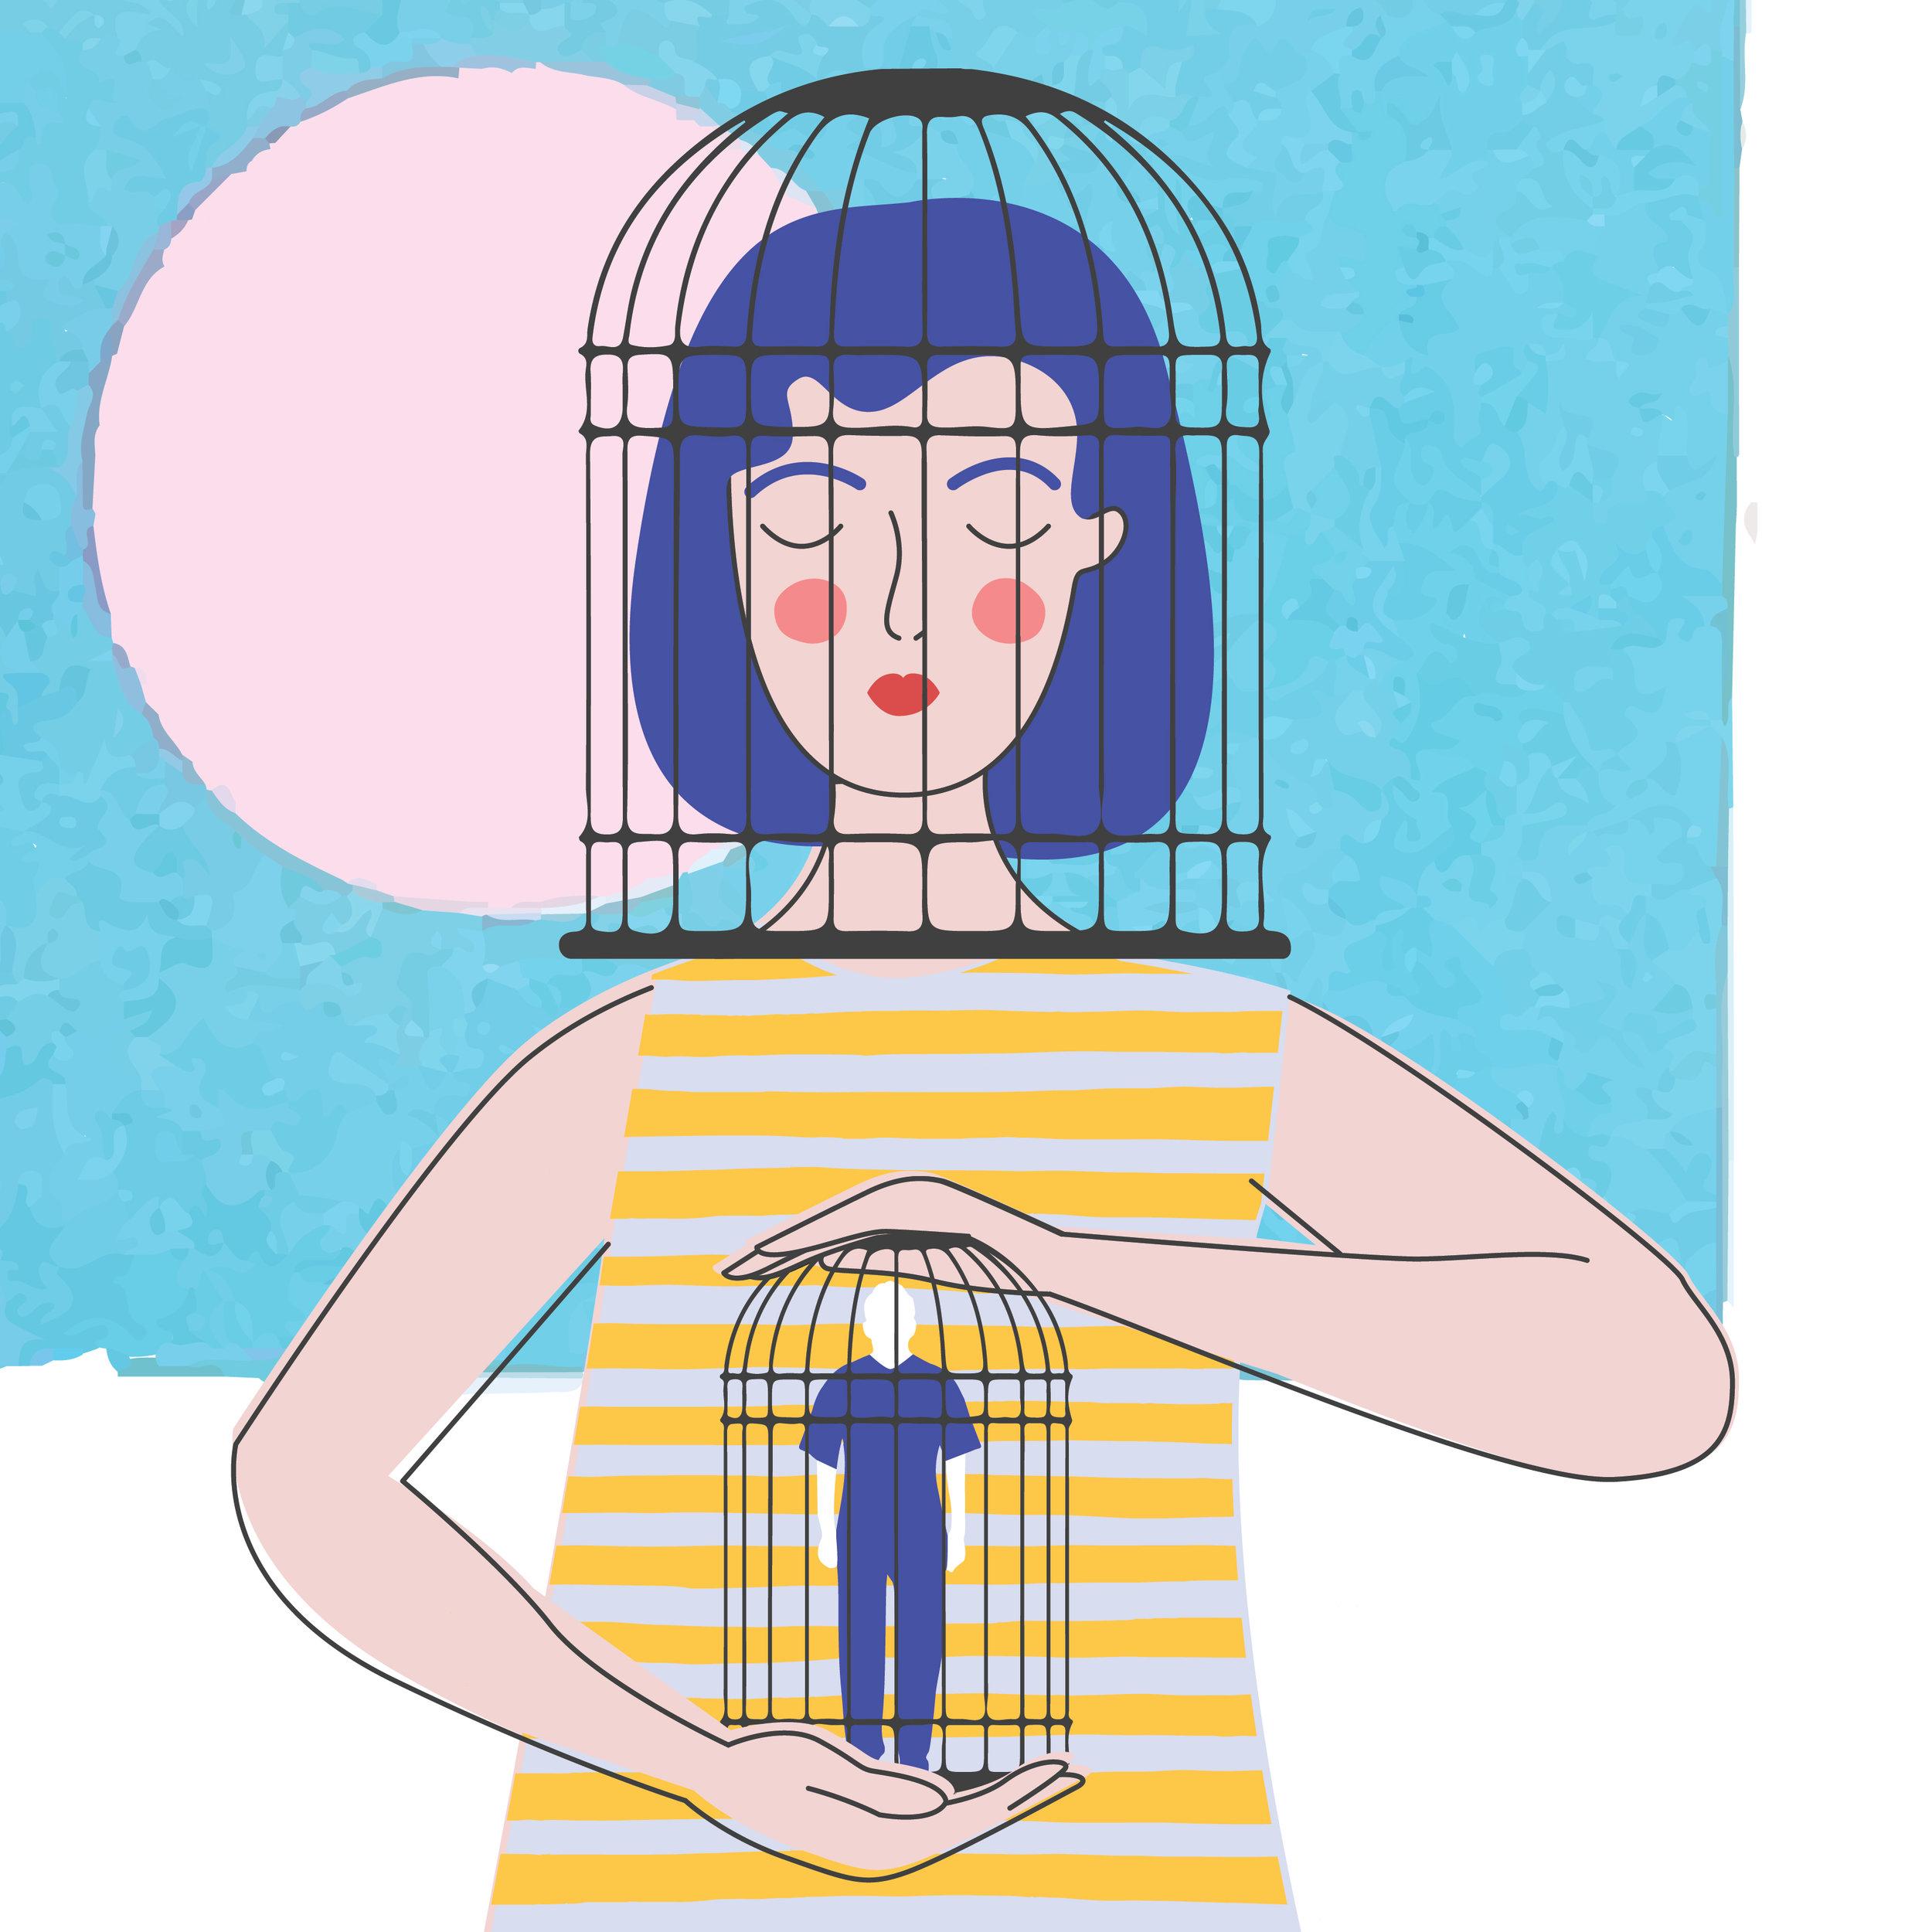 PART 6 En Route to Healing: SHAME, GUILT, PRESSURE